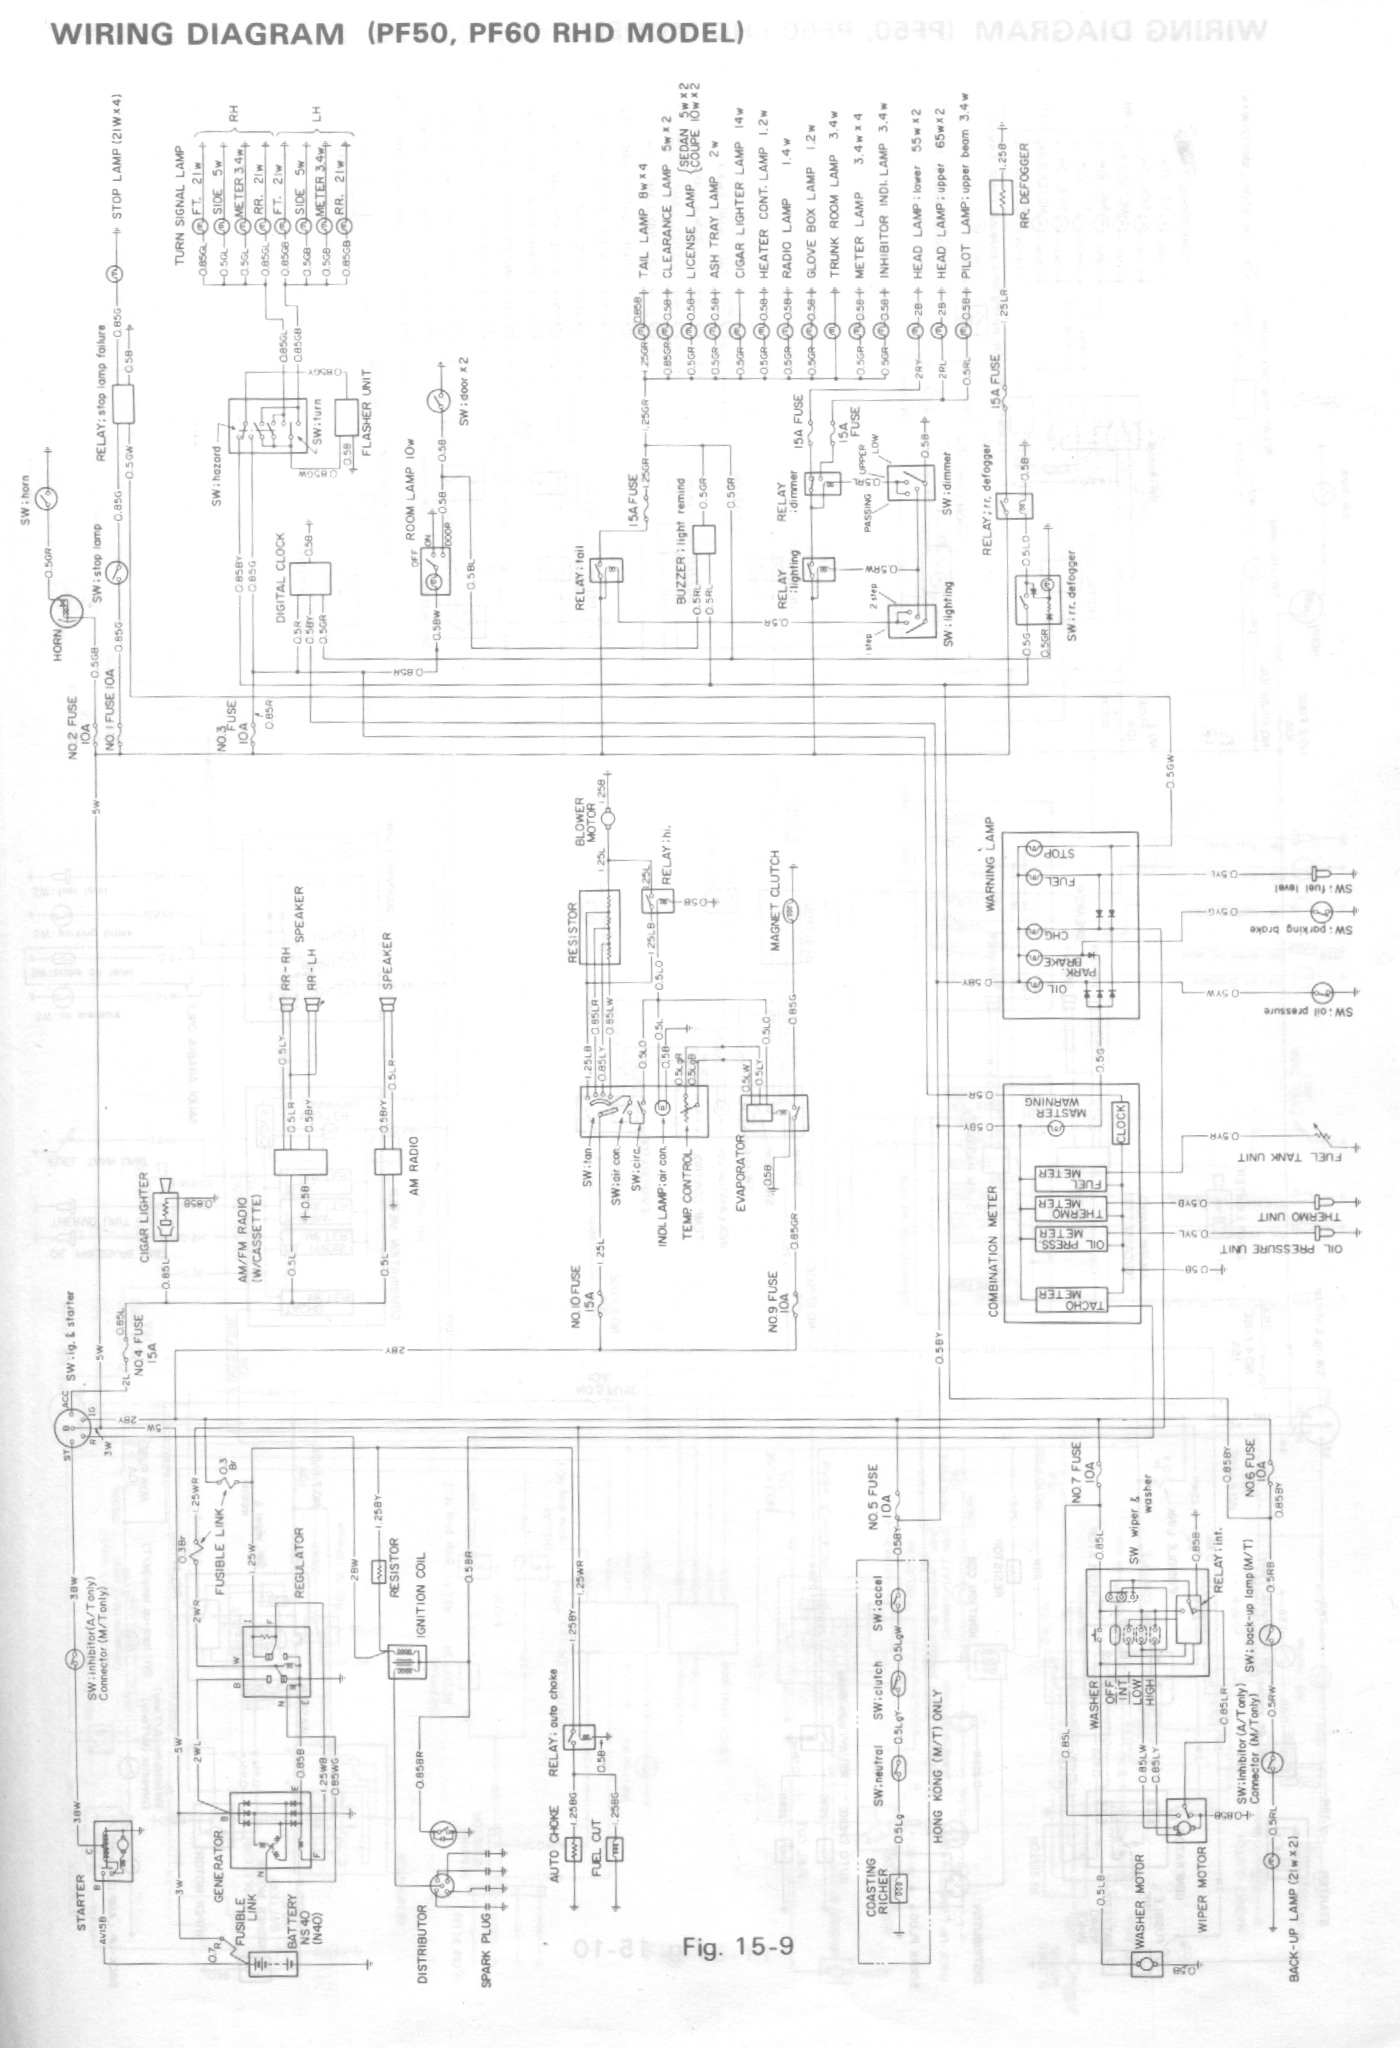 hight resolution of isuzu gemini wiring diagram wiring diagram schematics rh ksefanzone com isuzu rodeo radio wiring diagram isuzu